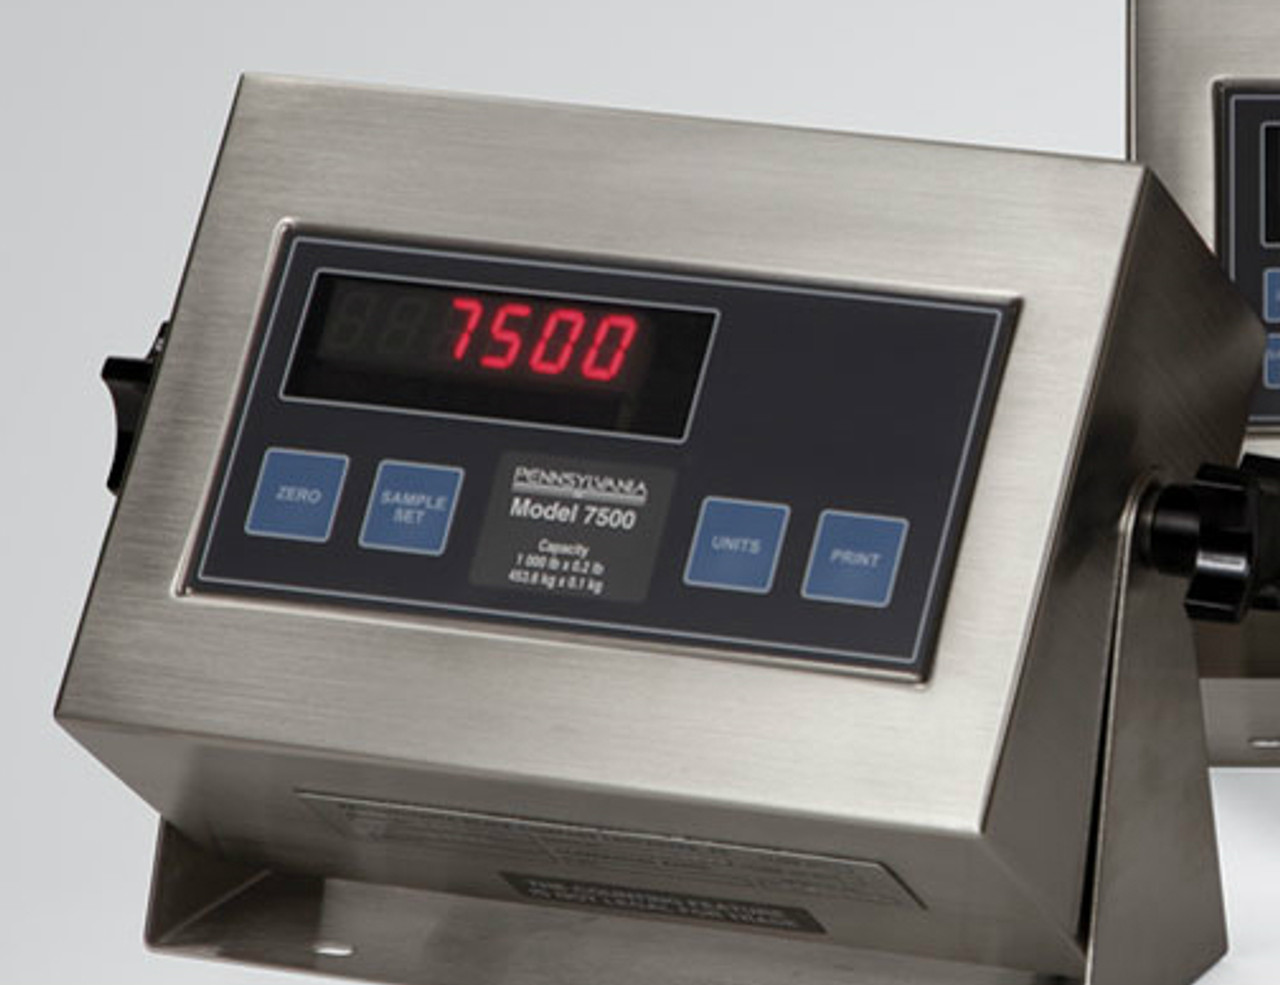 Pennsylvania 6600 Floor Scale with 7500 Indicator